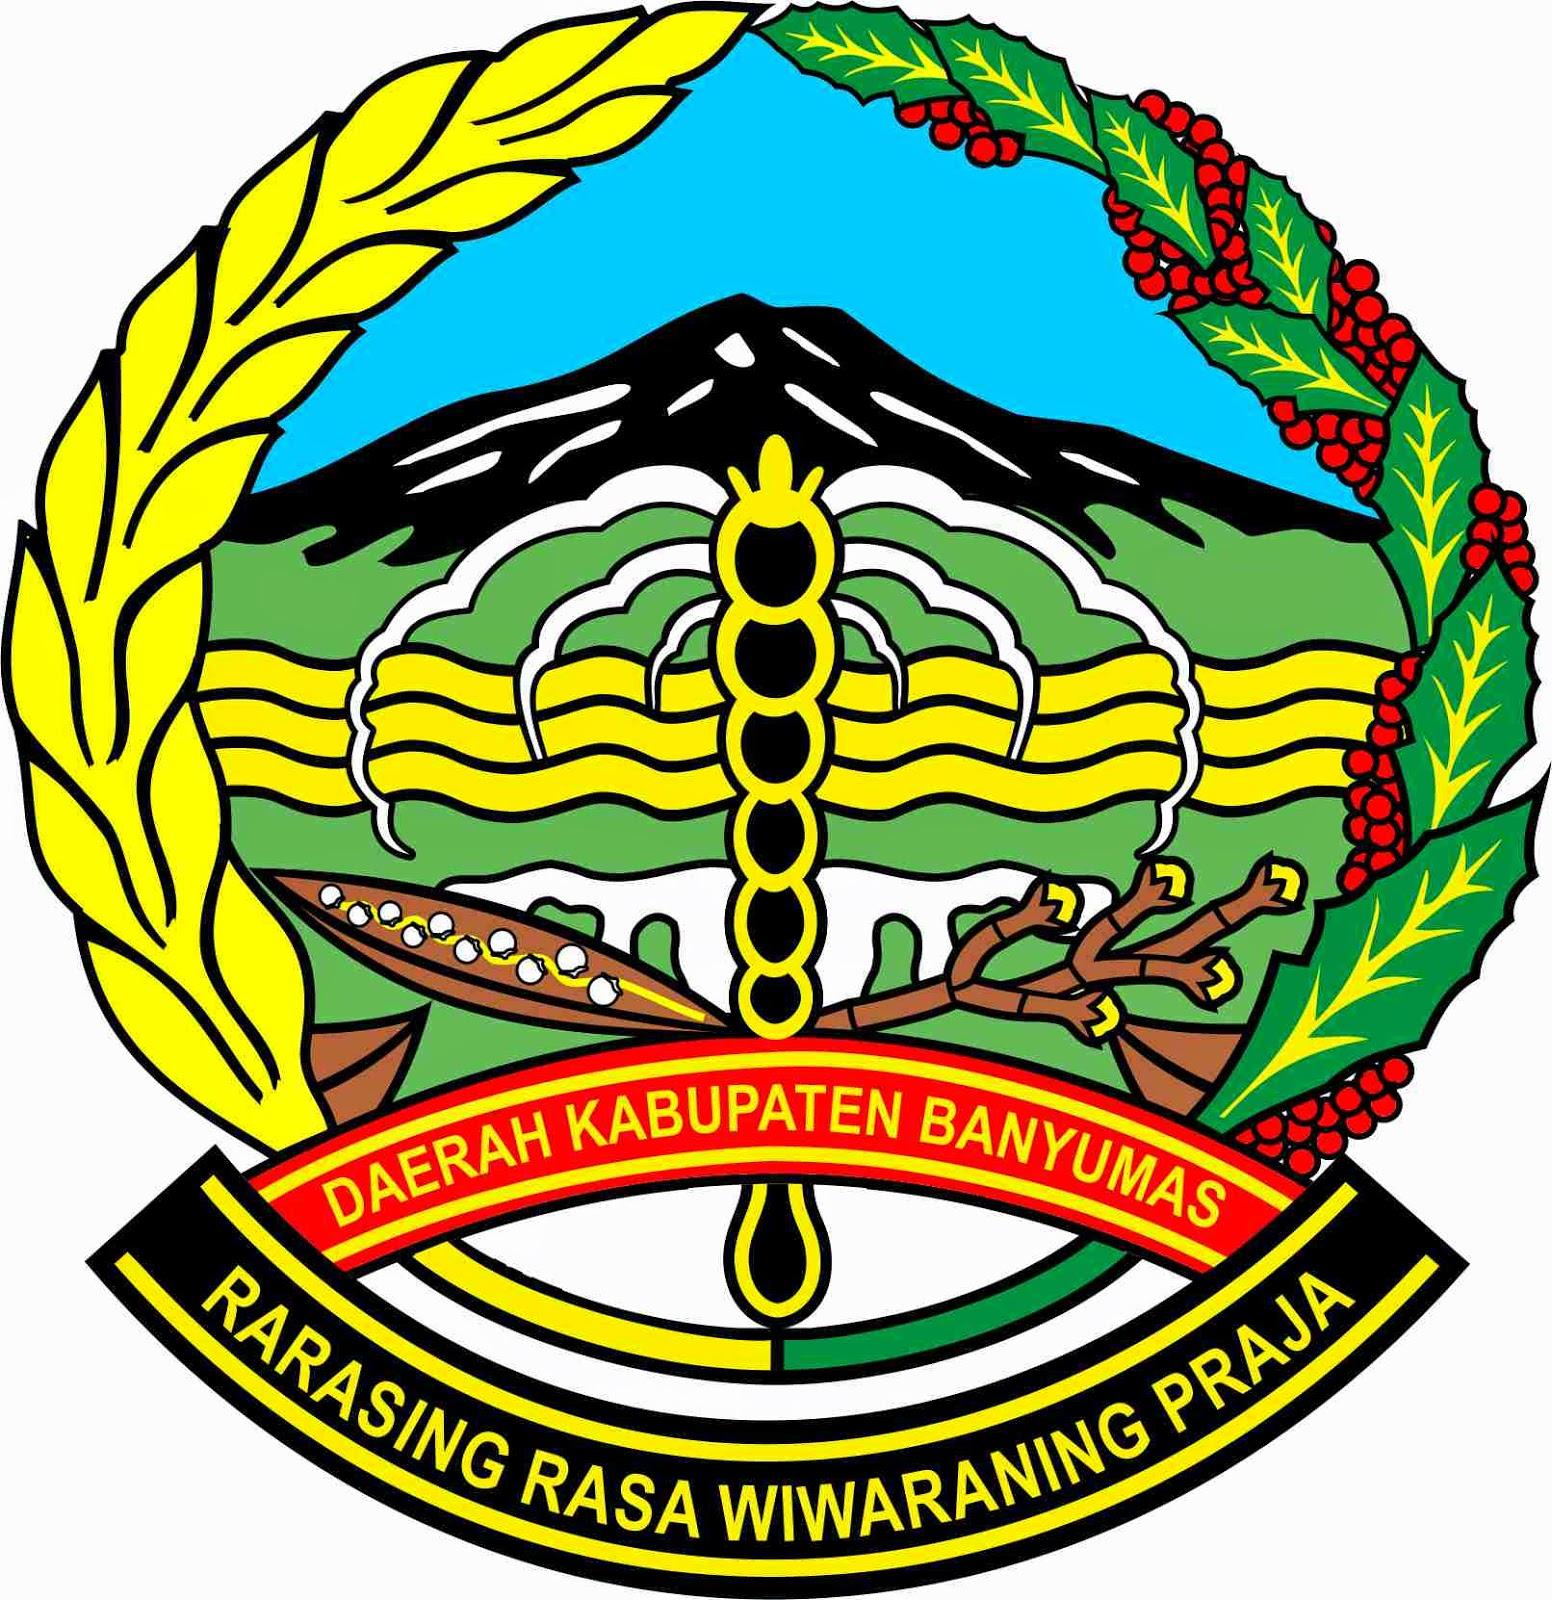 subkie sidik lambang kabupaten banyumas